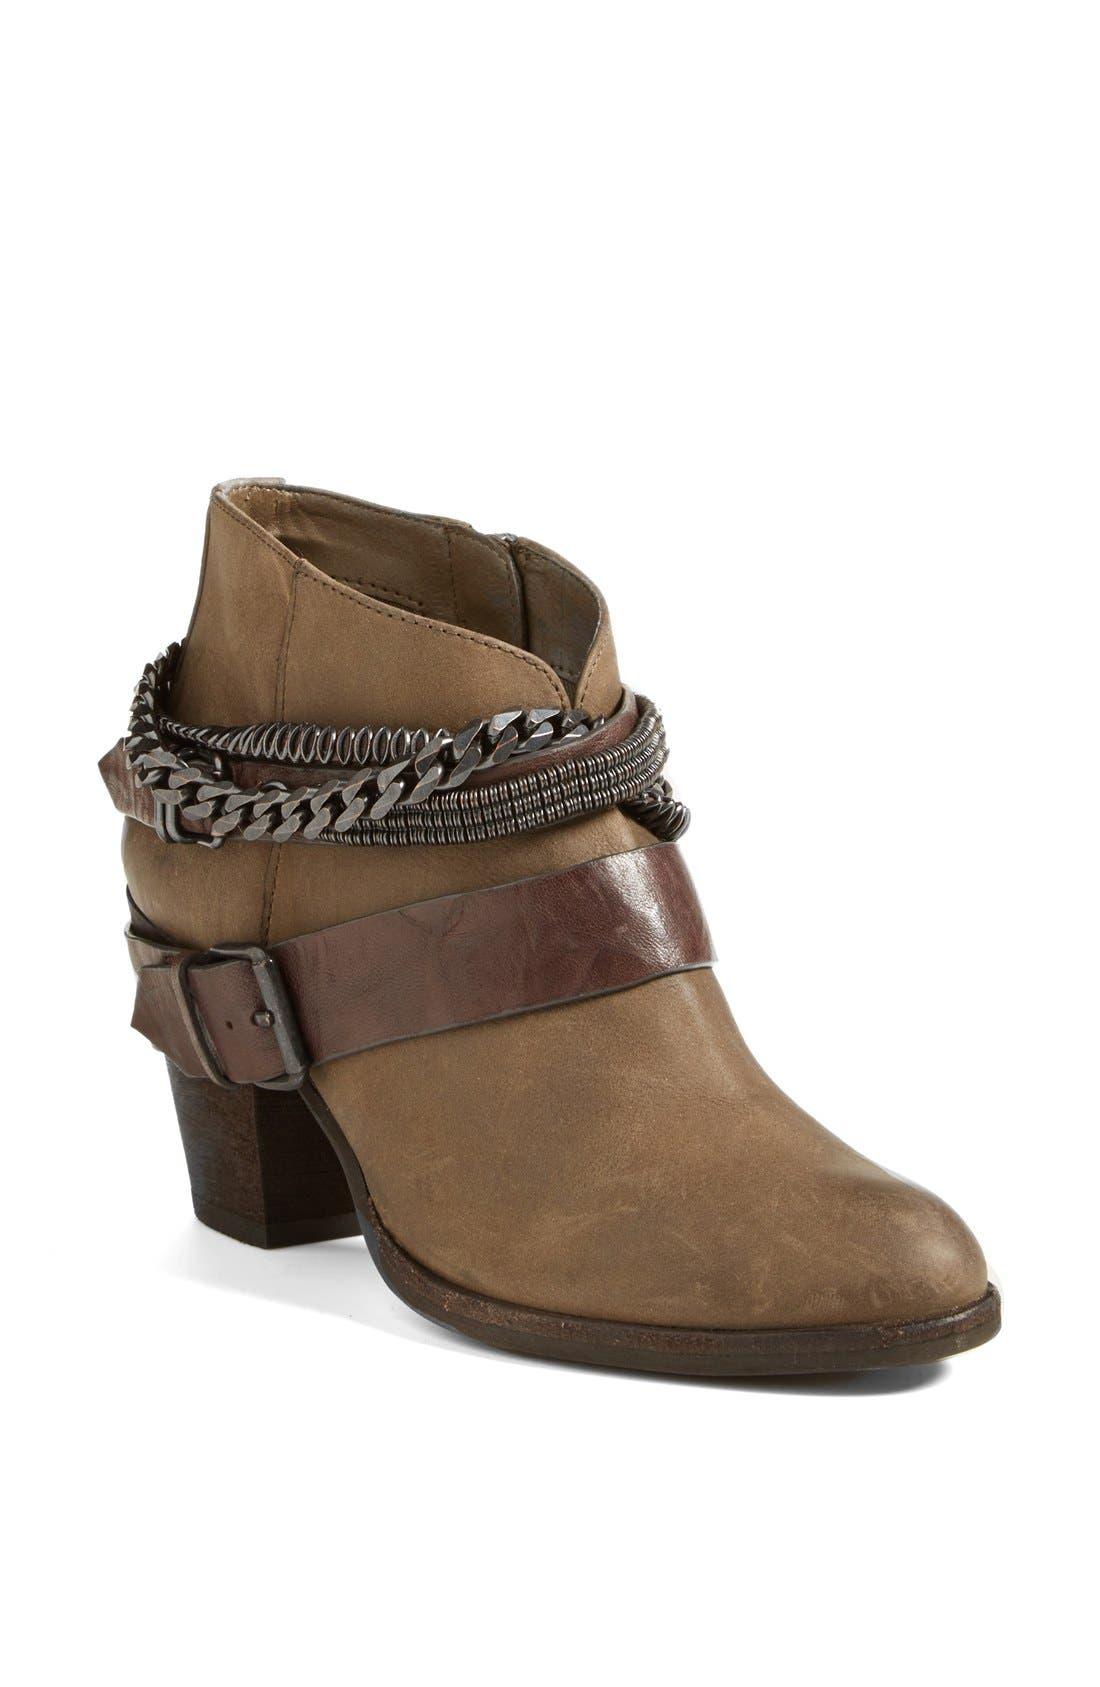 Main Image - Dolce Vita 'Yazmina' Leather Bootie (Women)